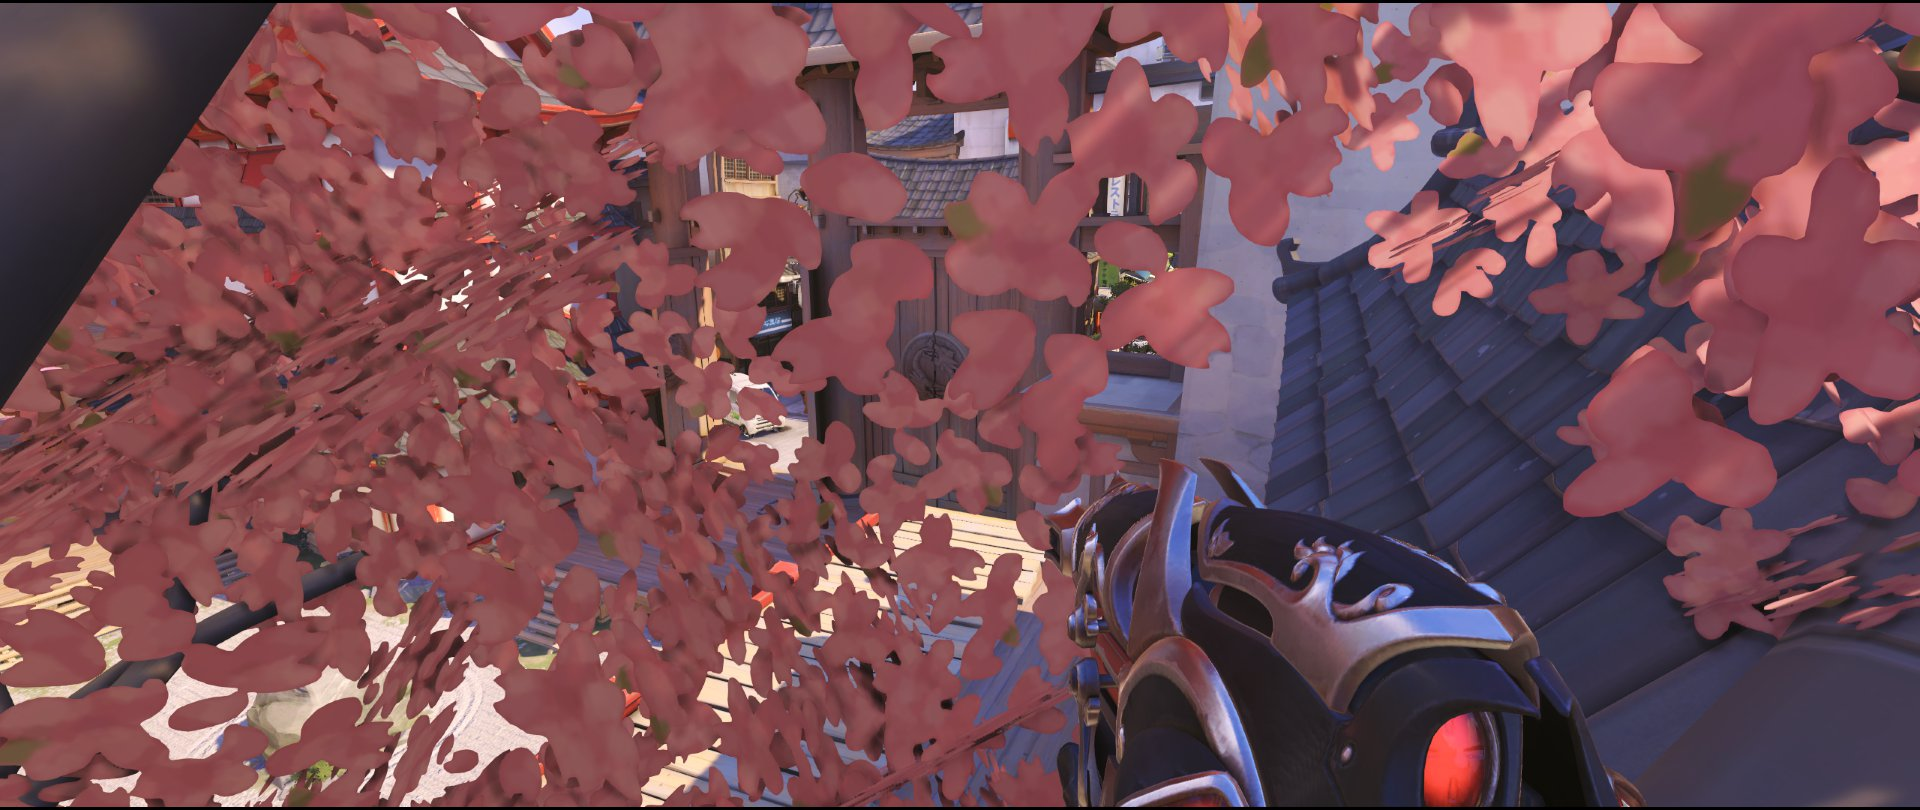 Tree placement defense Widowmaker sniping spot Hanamura Overwatch.jpg